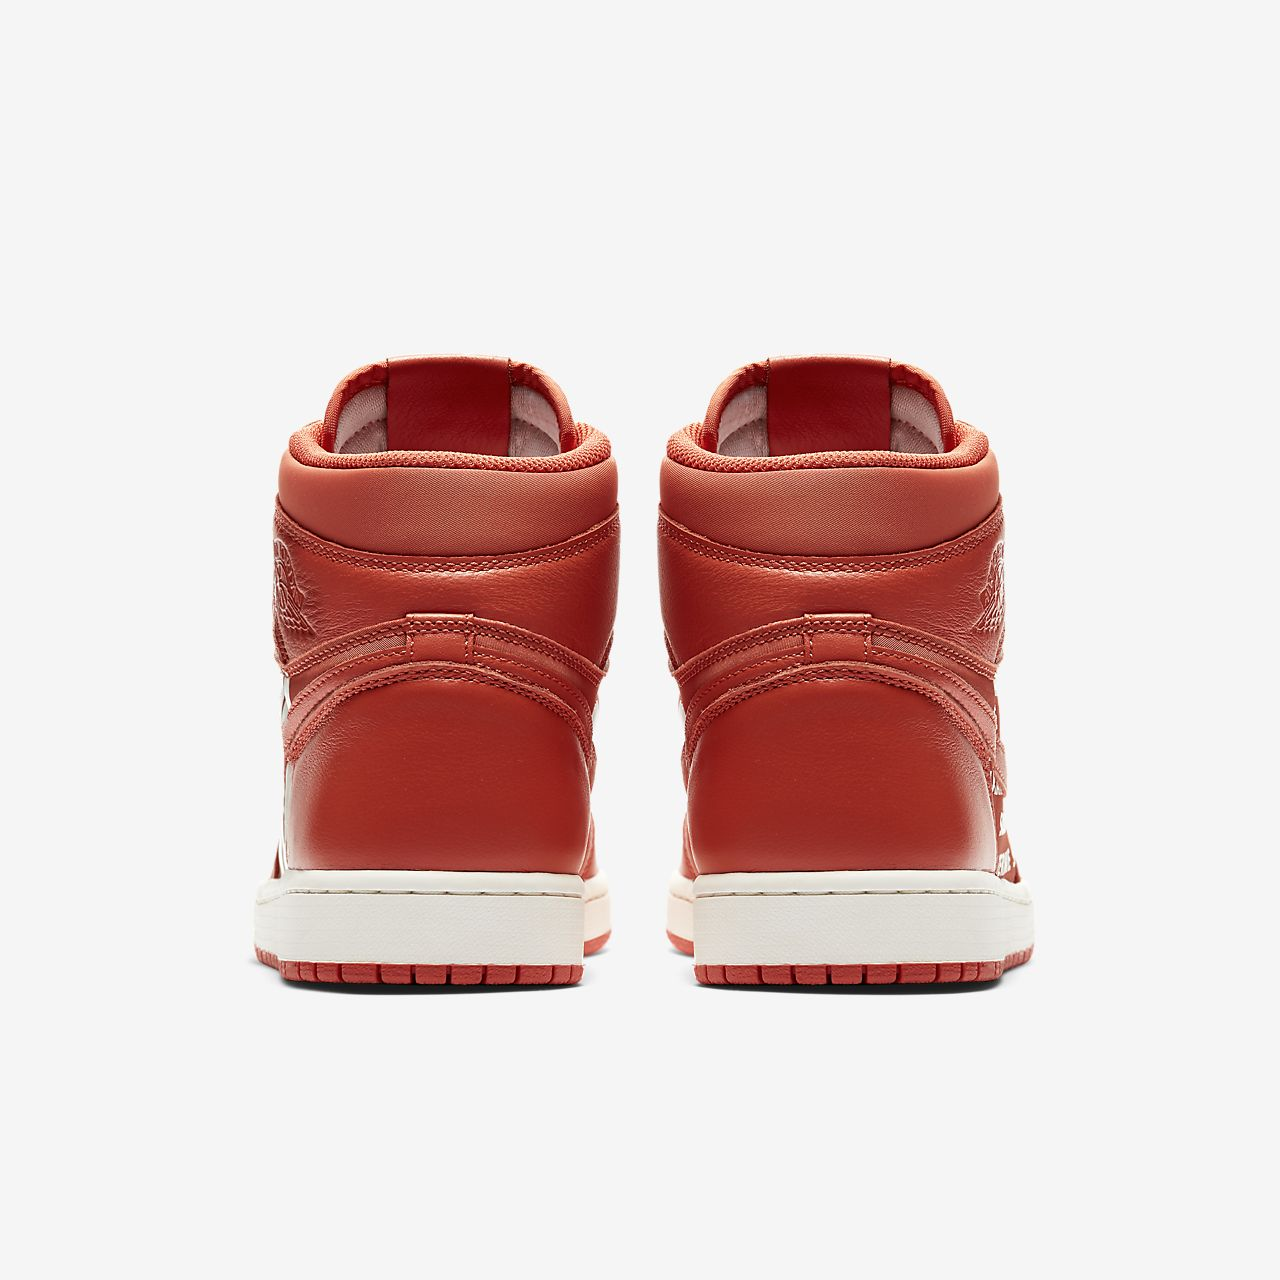 new styles b111c c0187 ... Air Jordan 1 Retro High OG Shoe